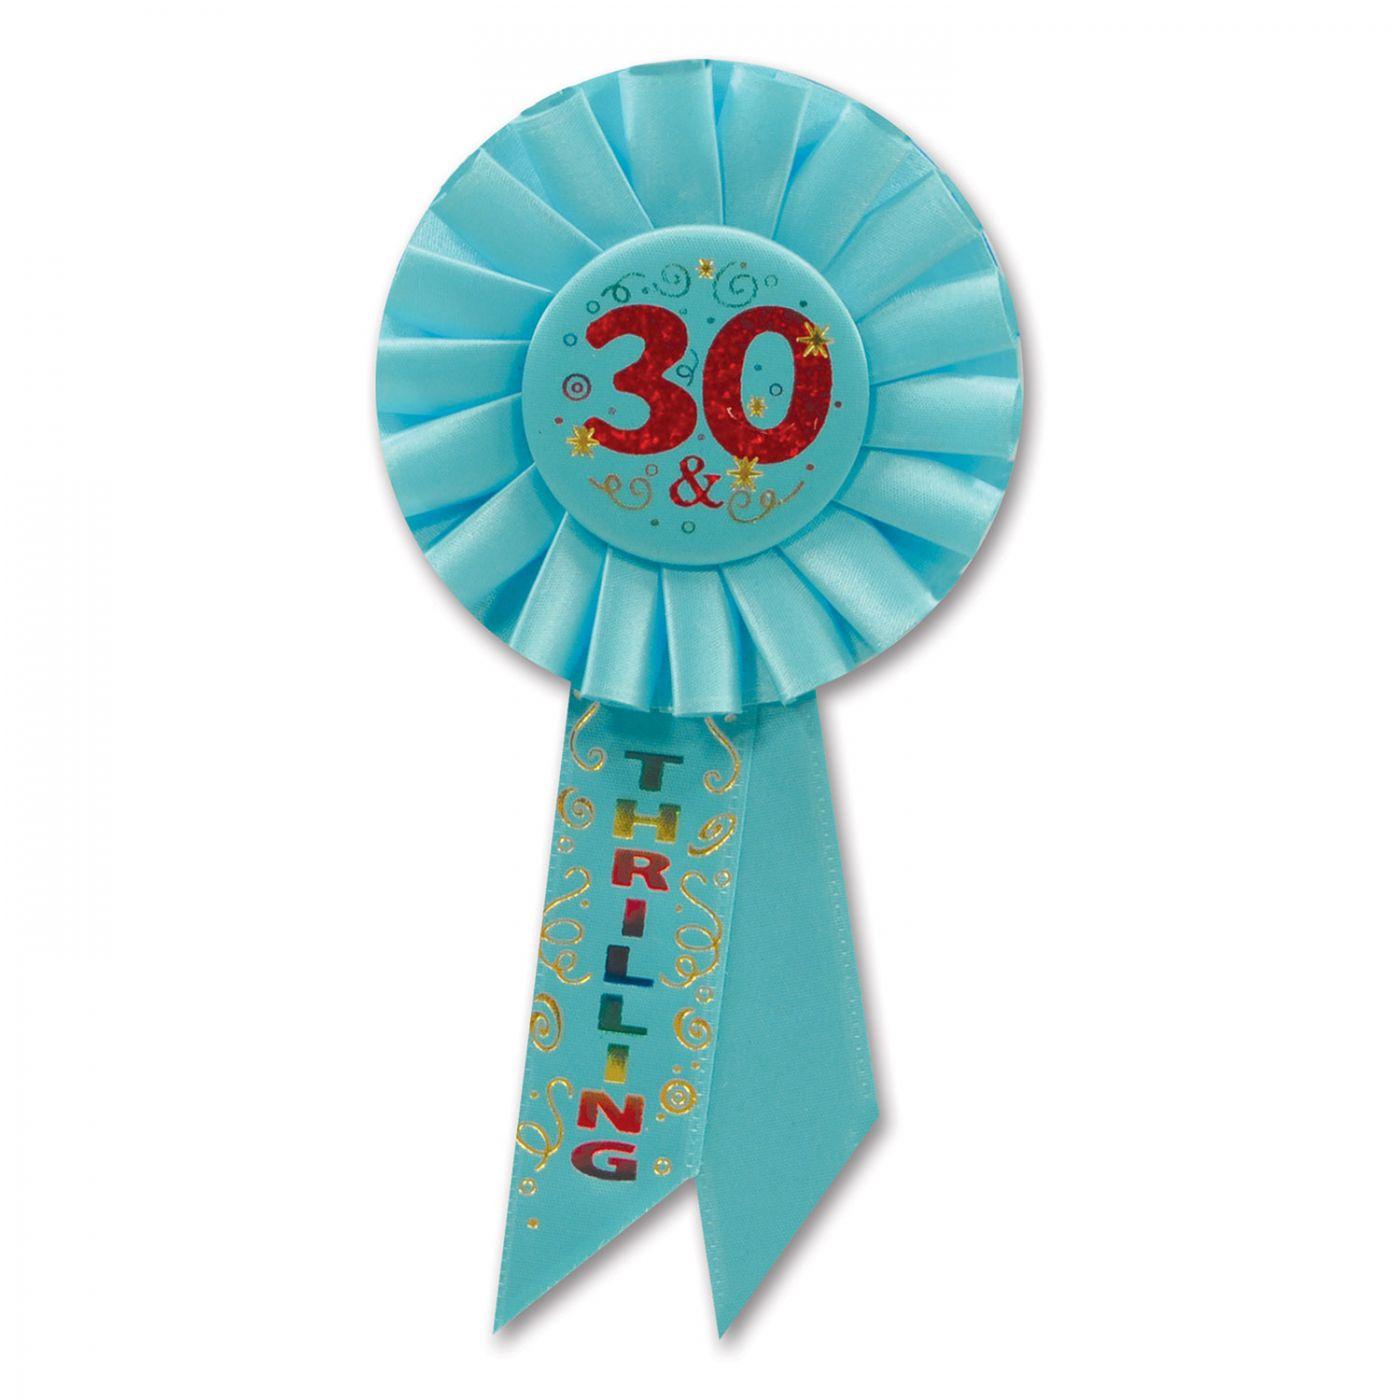 Image of 30 & Thrilling Rosette (6)